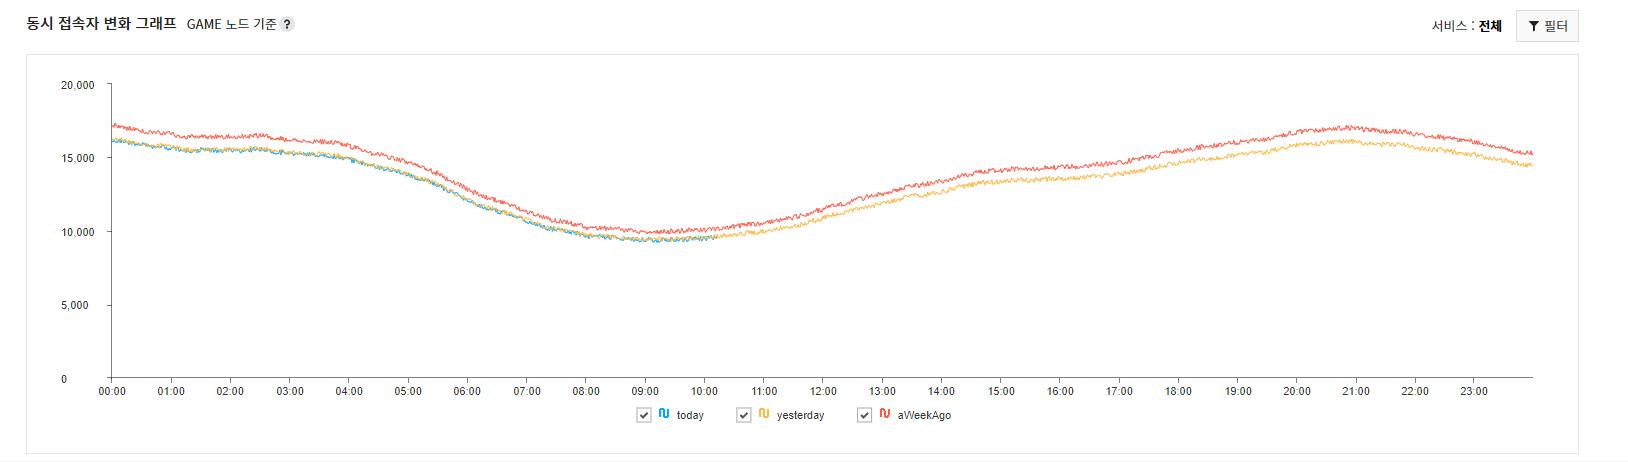 monitoring_dashboard_graph